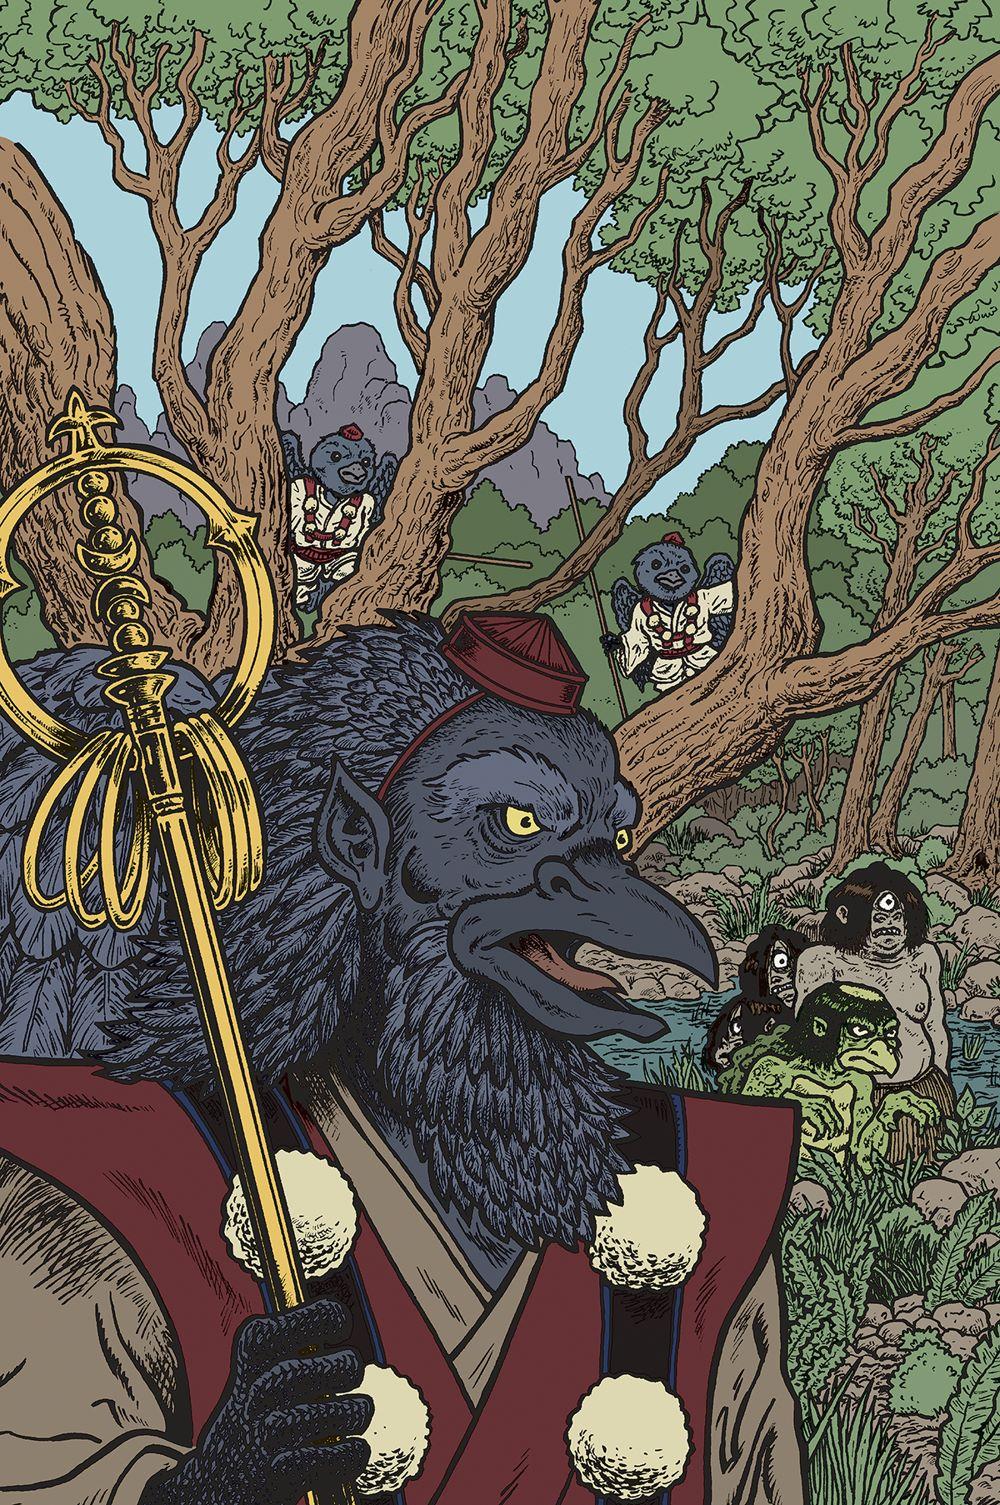 BOFBOT_i4_Variant_FC_FNL Dark Horse Comics July 2021 Solicitations